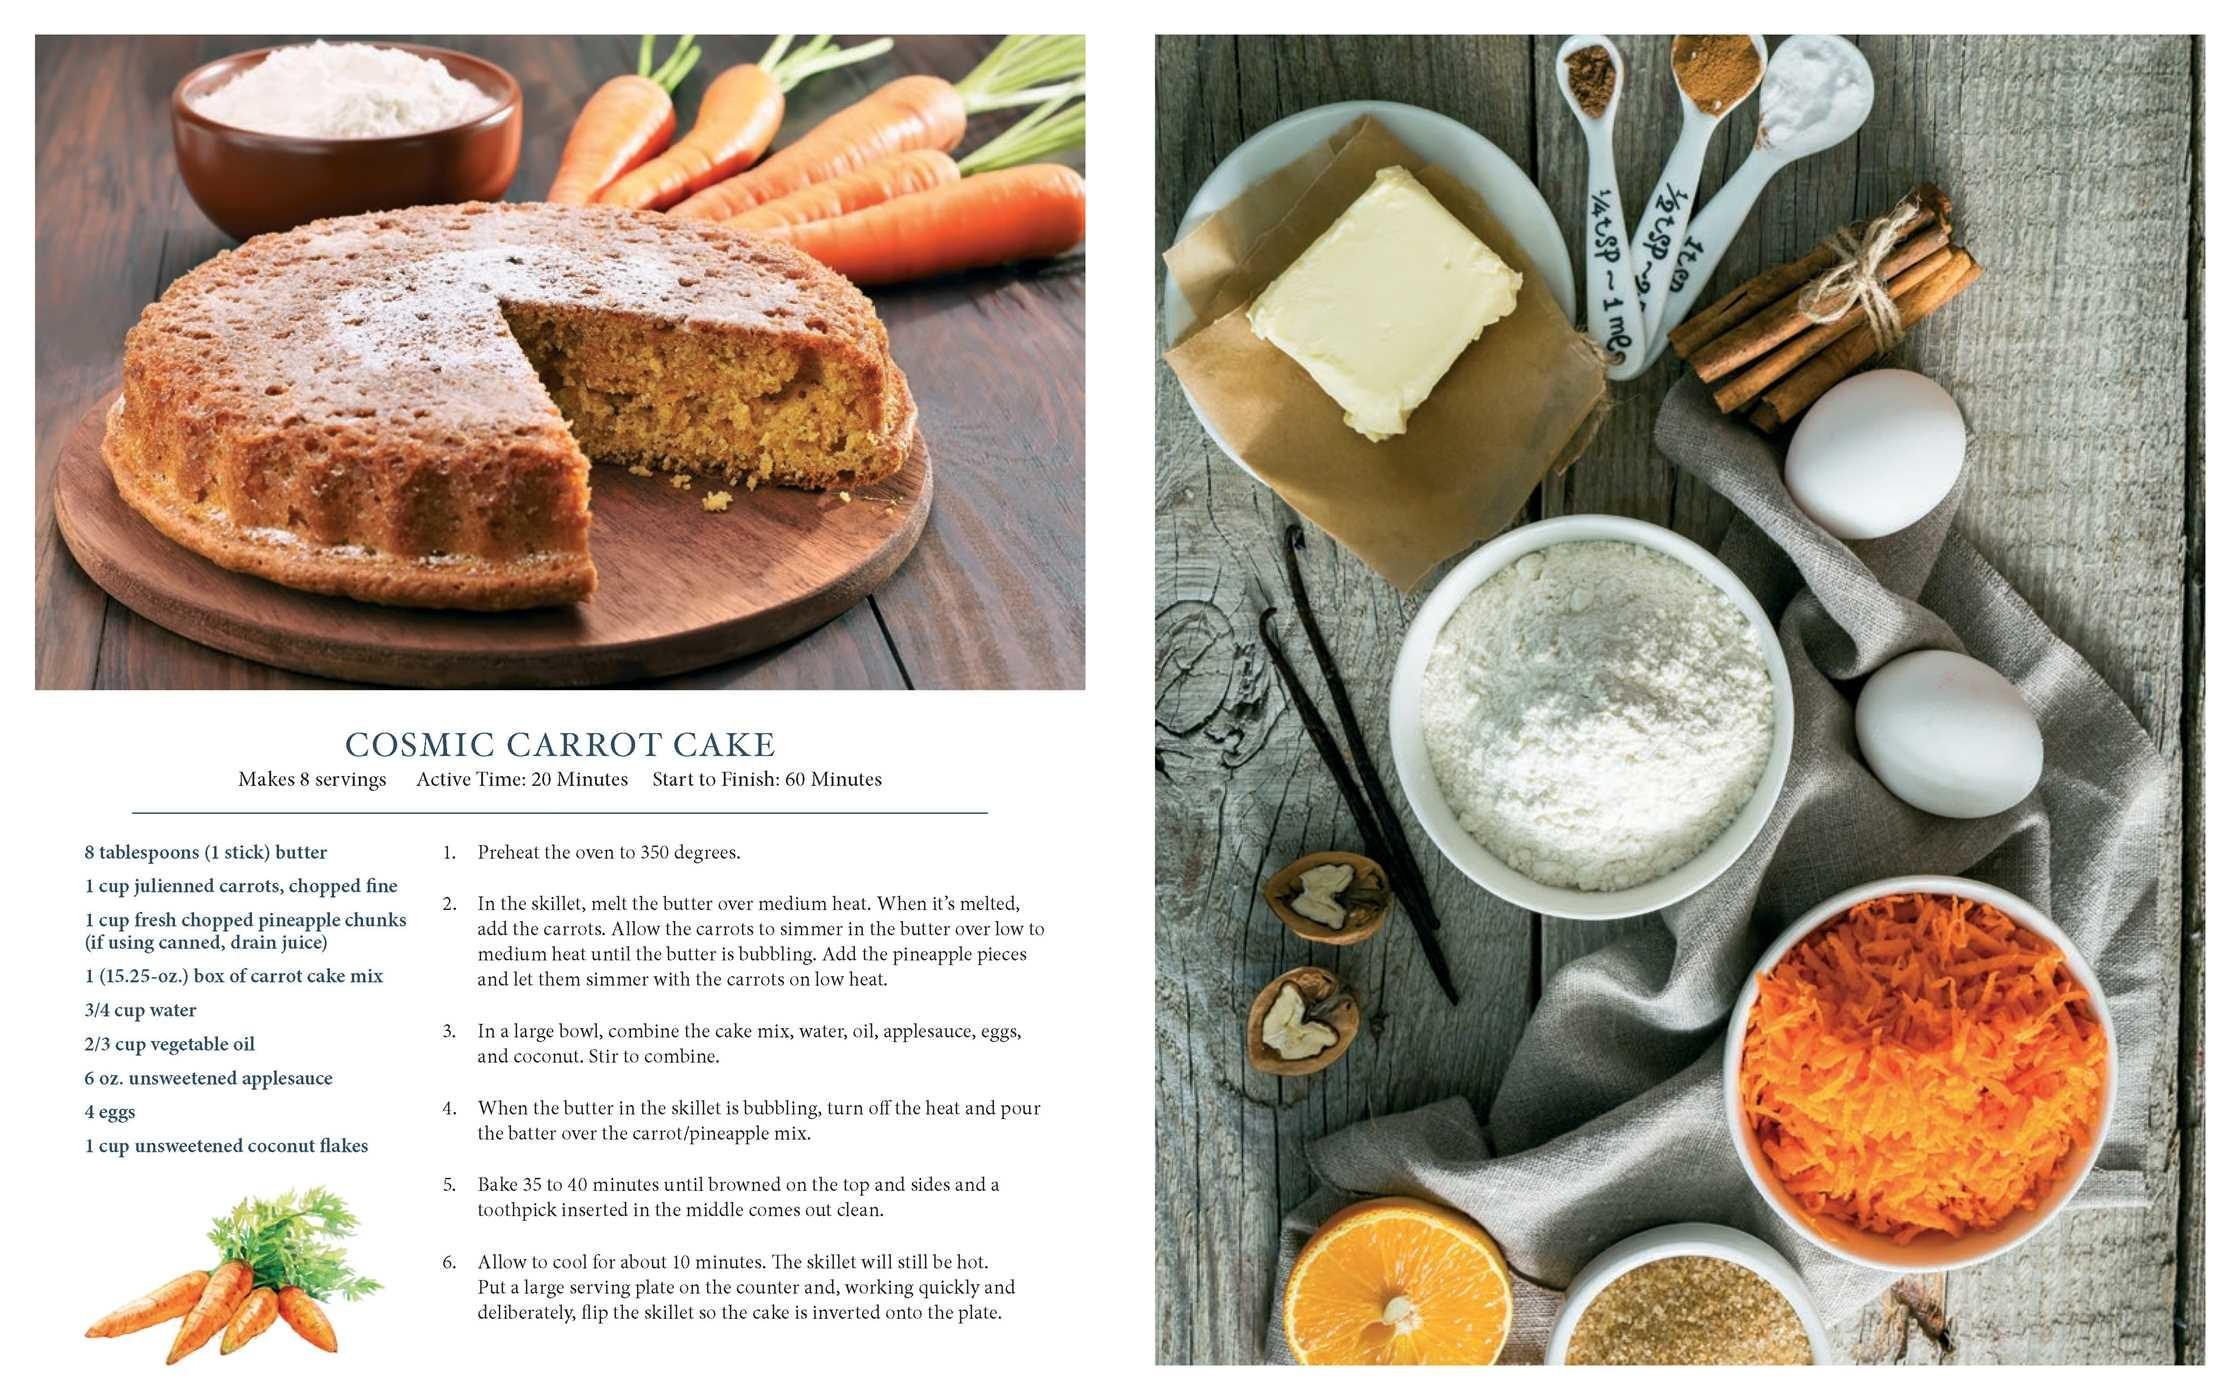 The sunday dinner cookbook 9781604337525.in07